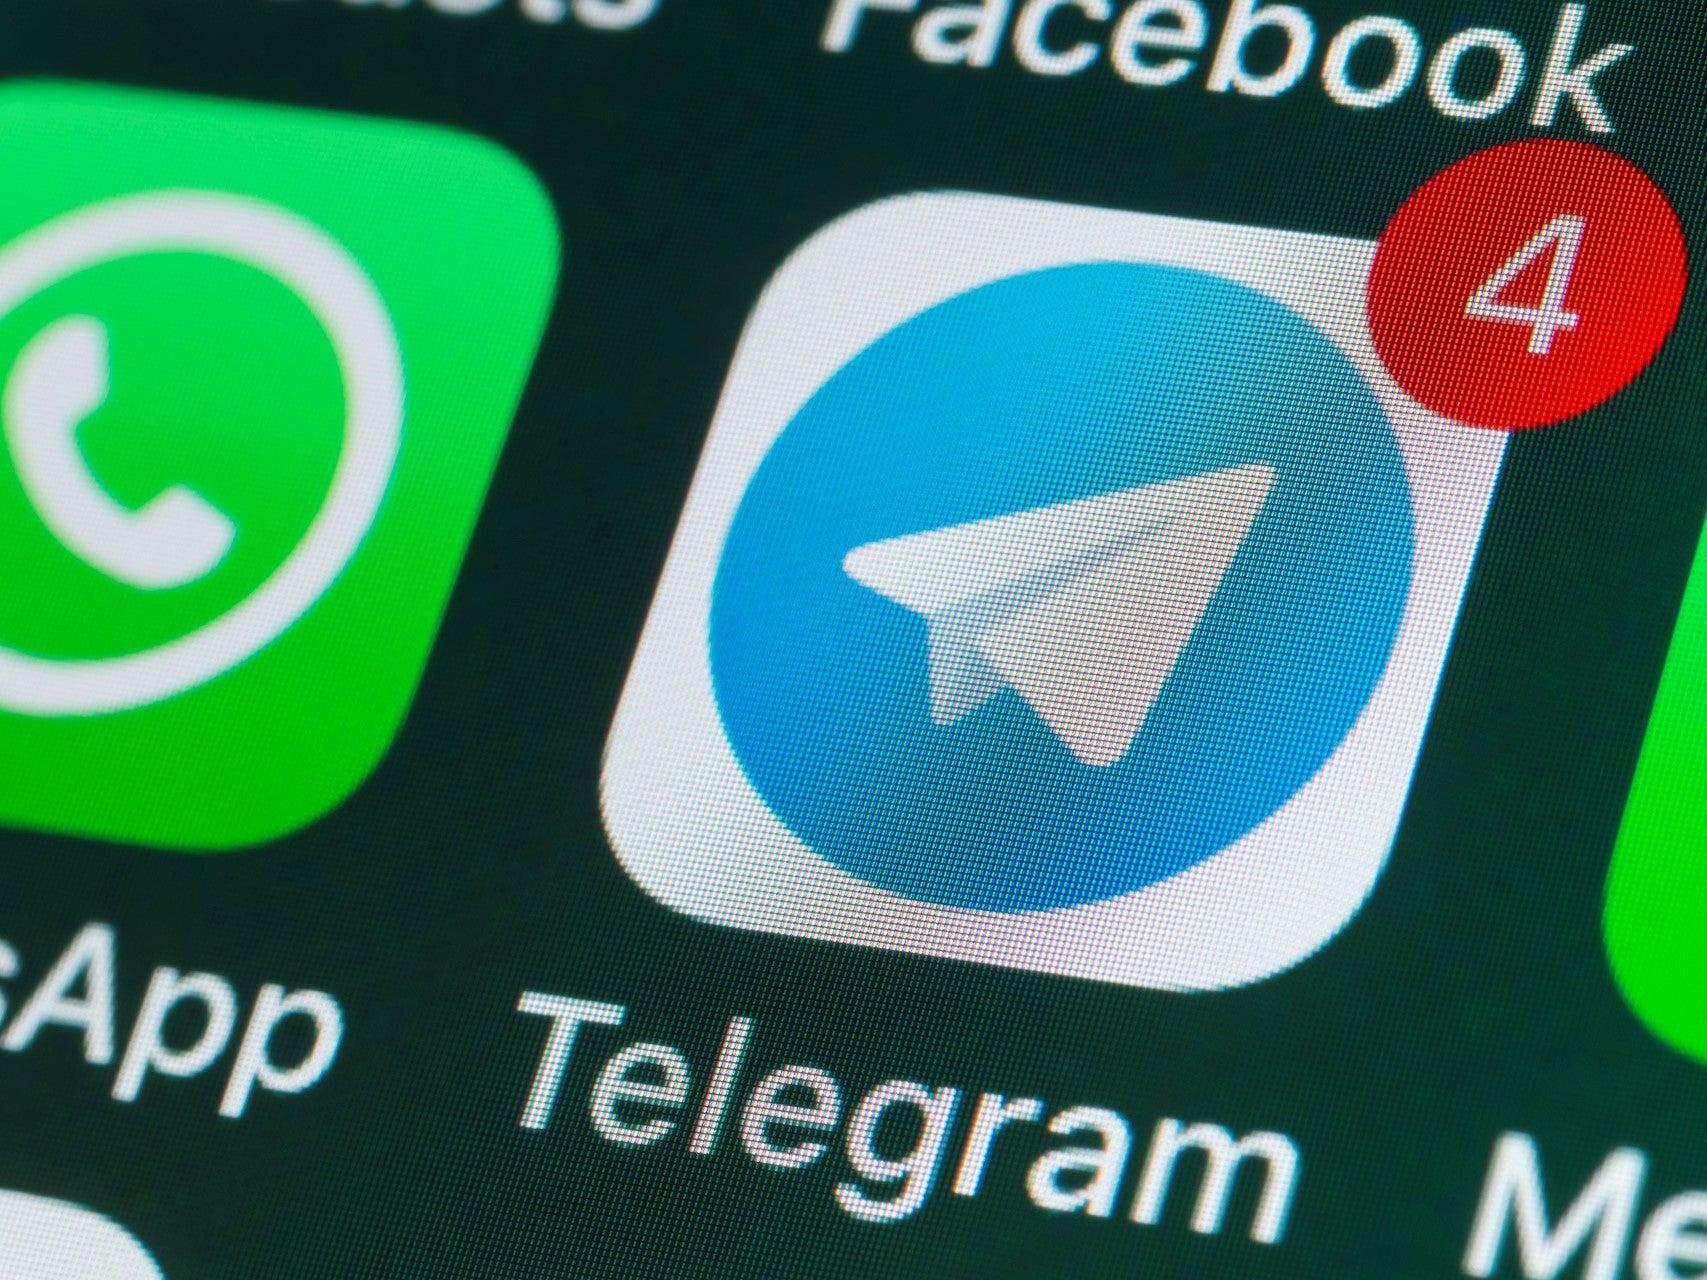 WhatsApp exodus is 'largest digital migration in human history', Telegram boss says